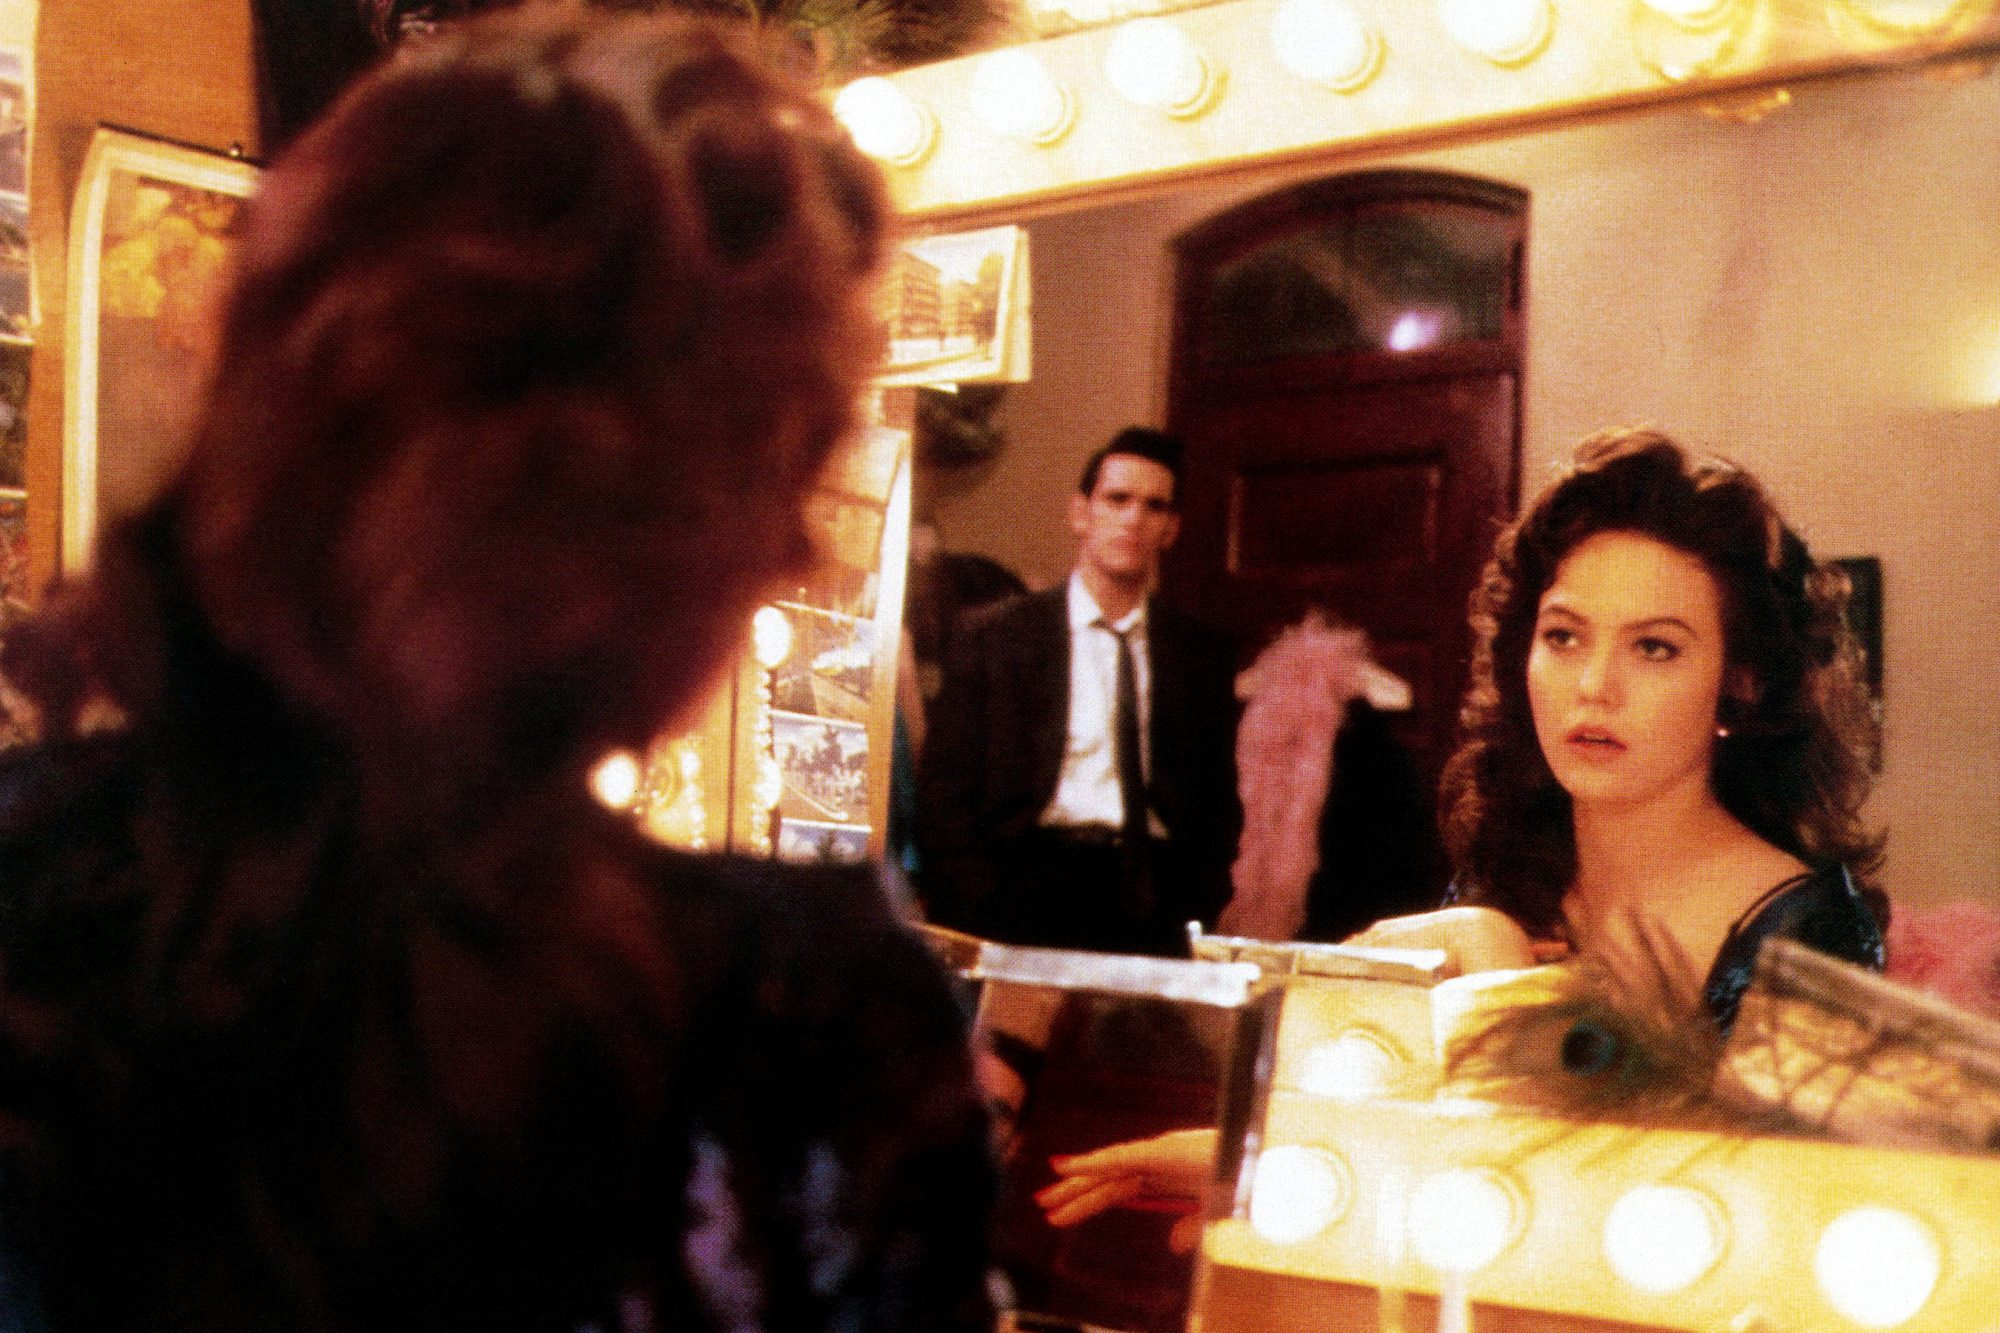 THE BIG TOWN, in mirror from left: Matt Dillon, Diane Lane, 1987, © Columbia/courtesy Everett Collec